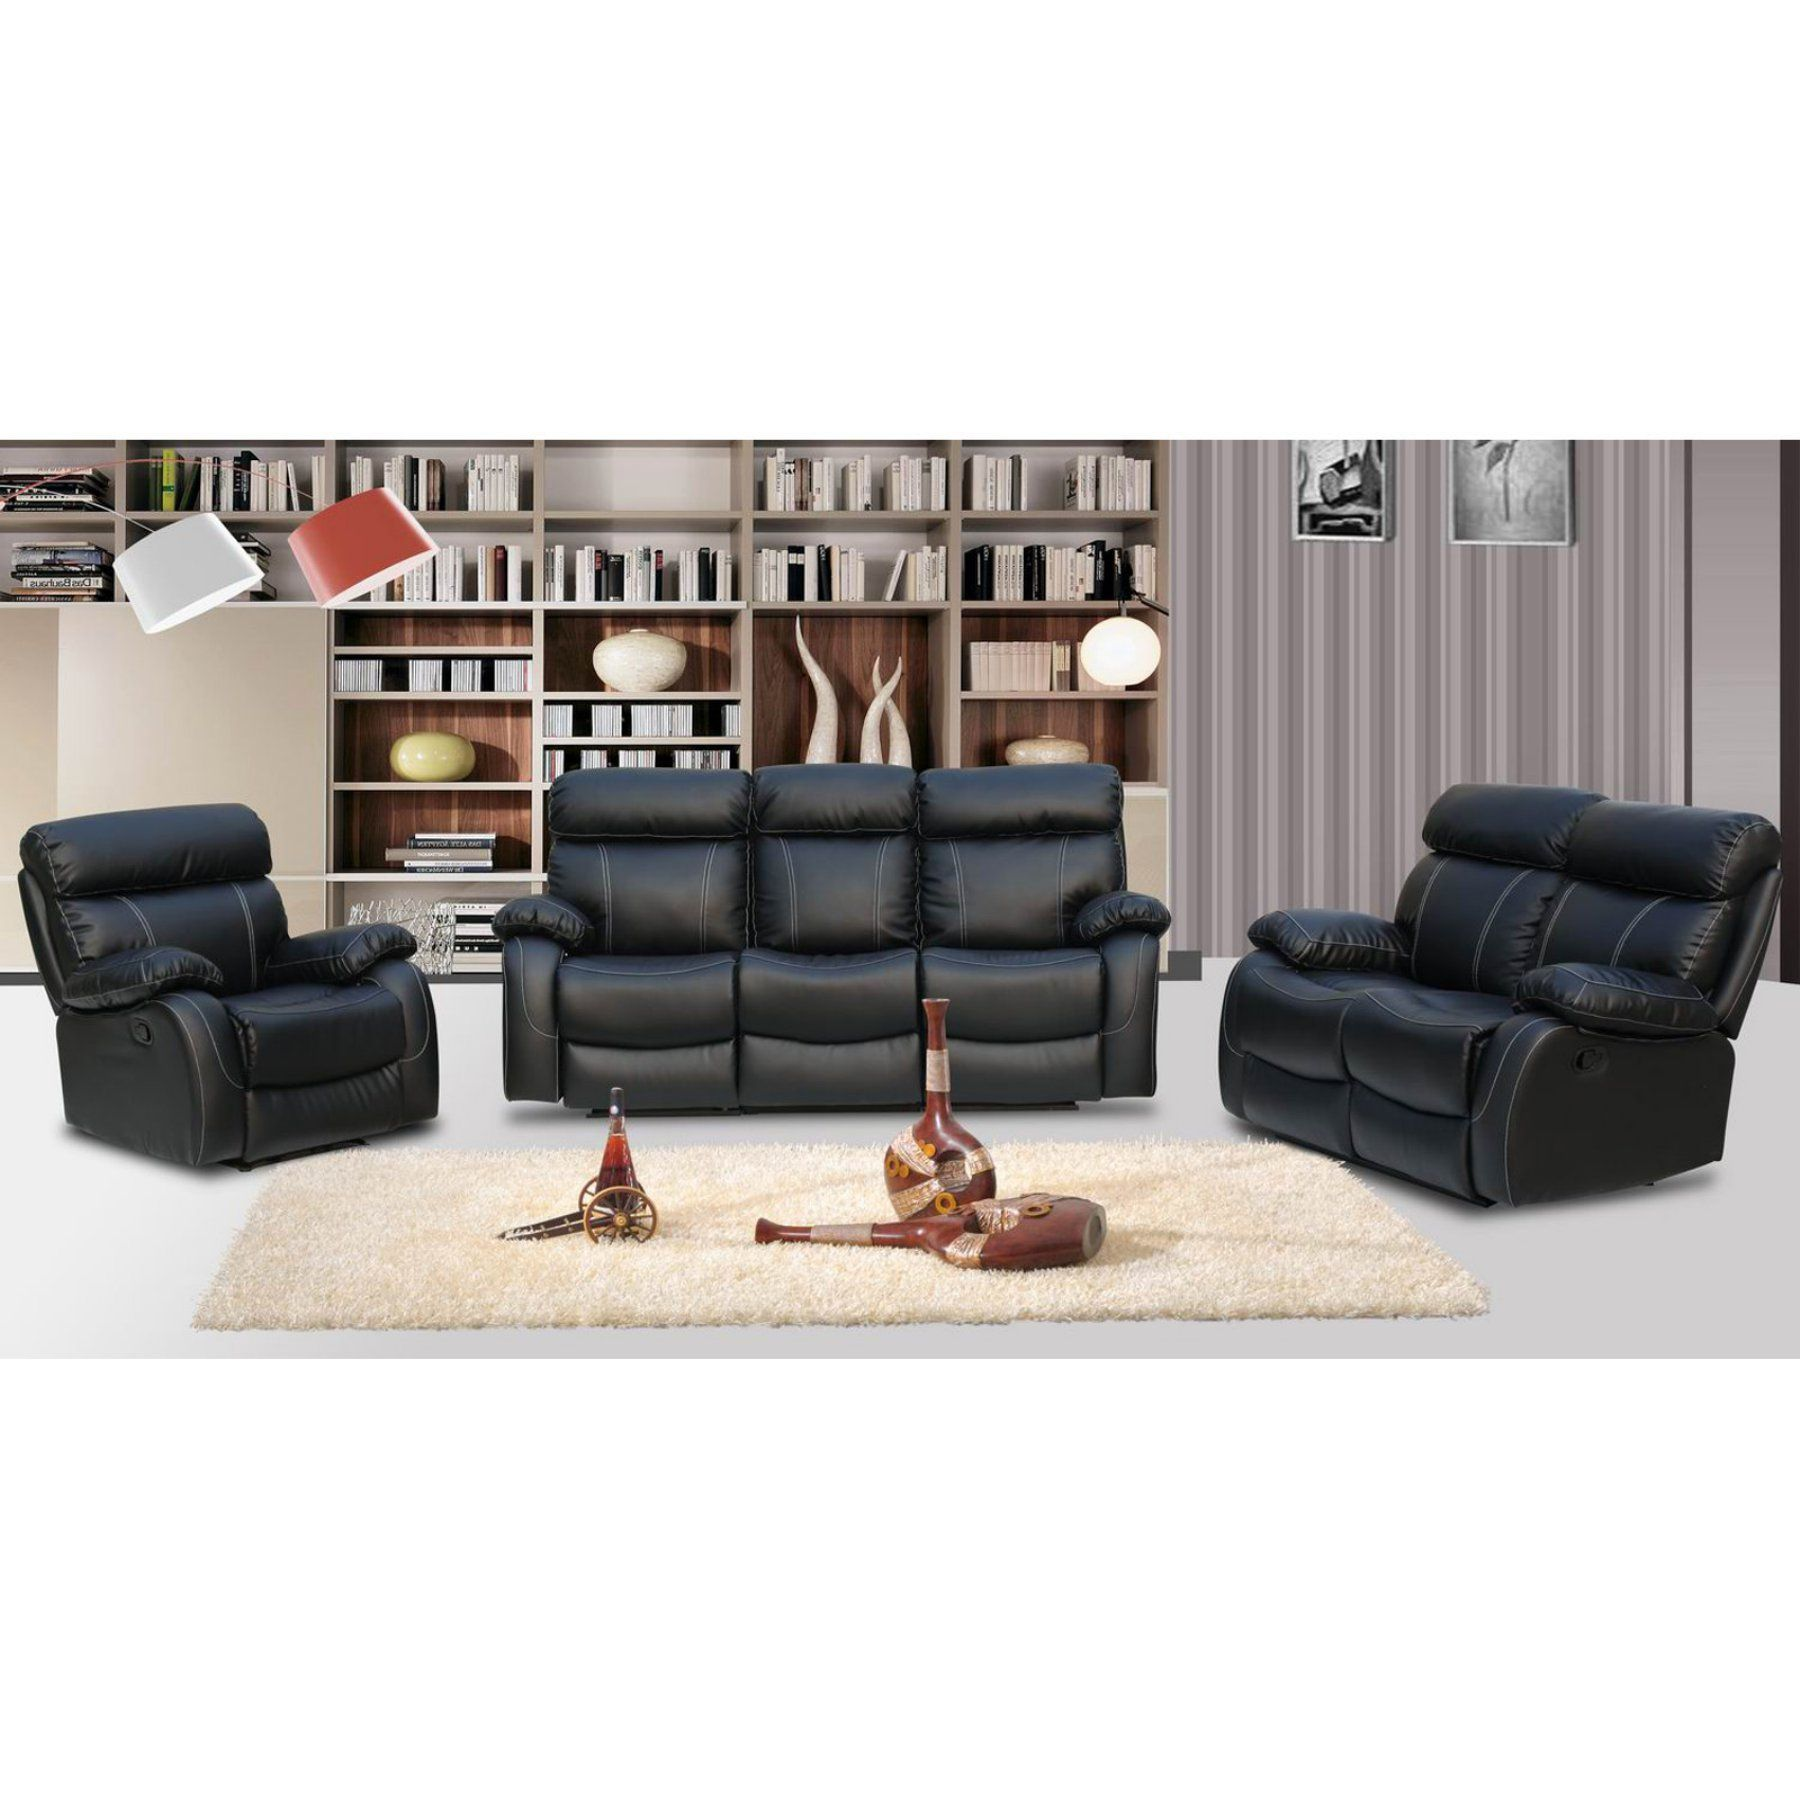 primo international chateau penache reclining sofa 16661 canape lit canape et causeuse